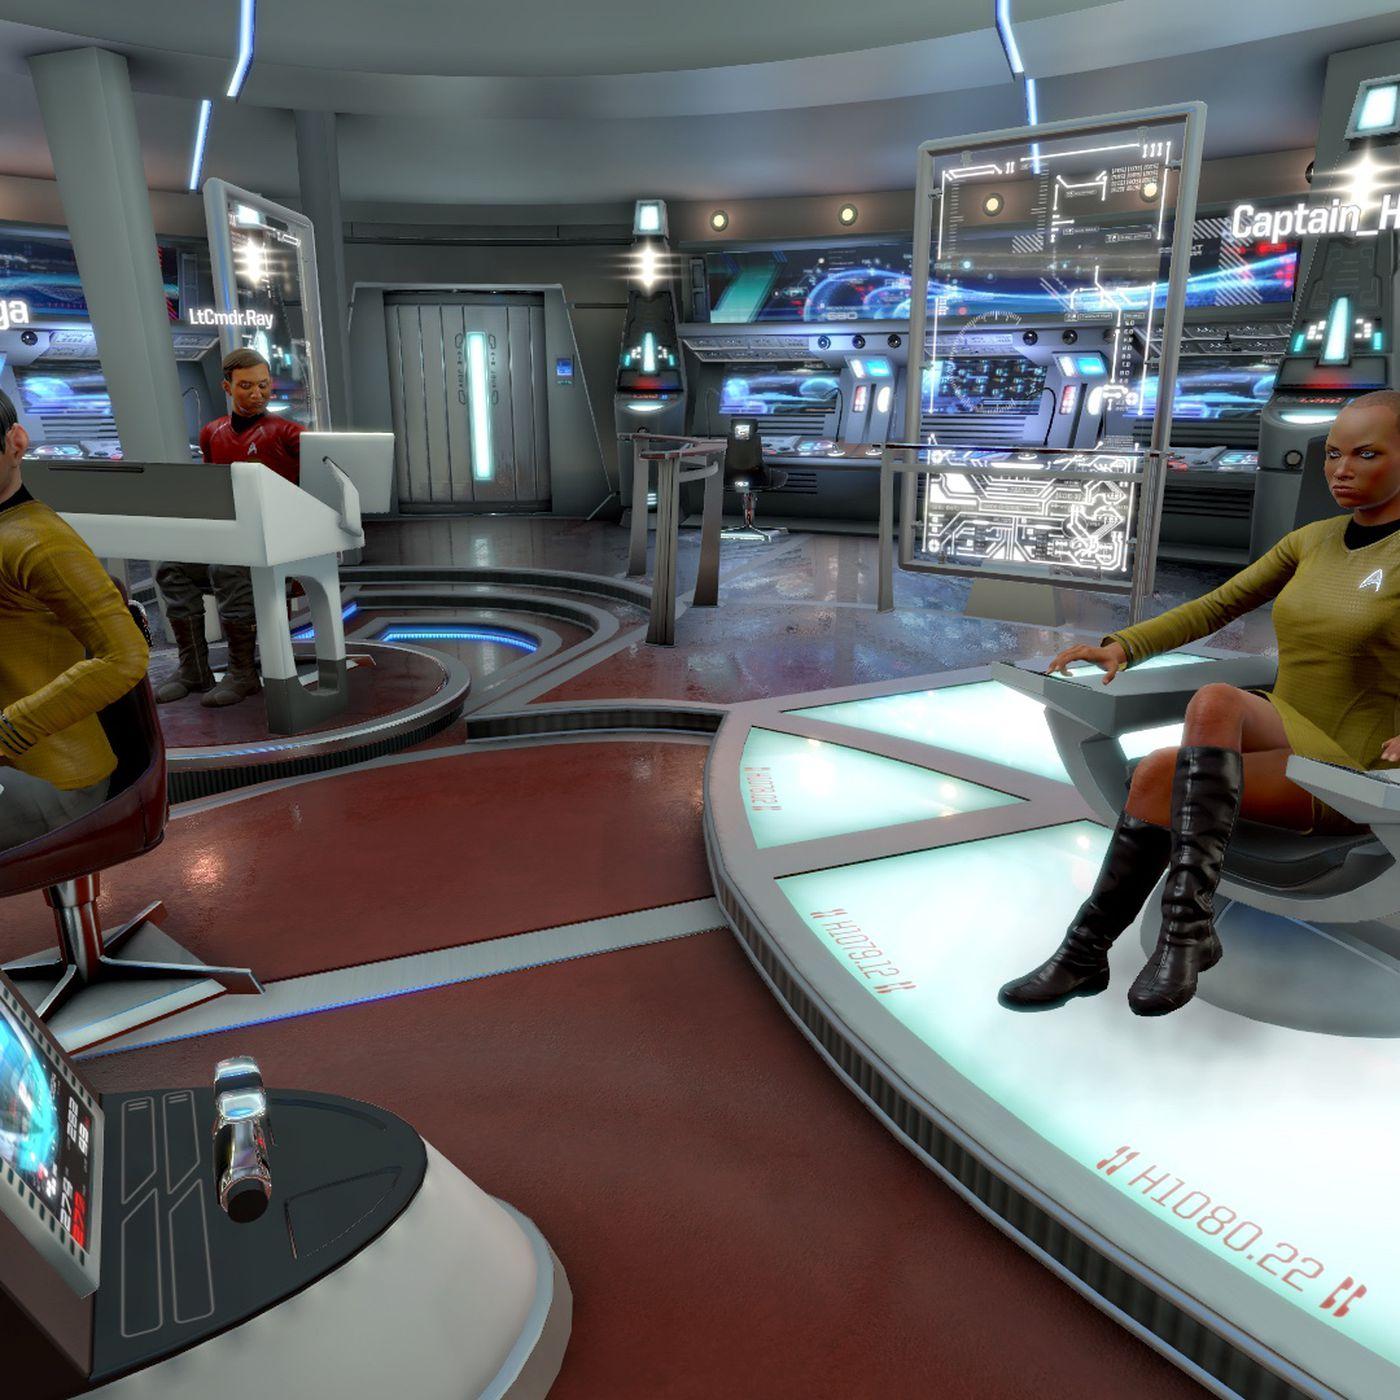 Star Trek: Bridge Crew no longer requires VR - Polygon